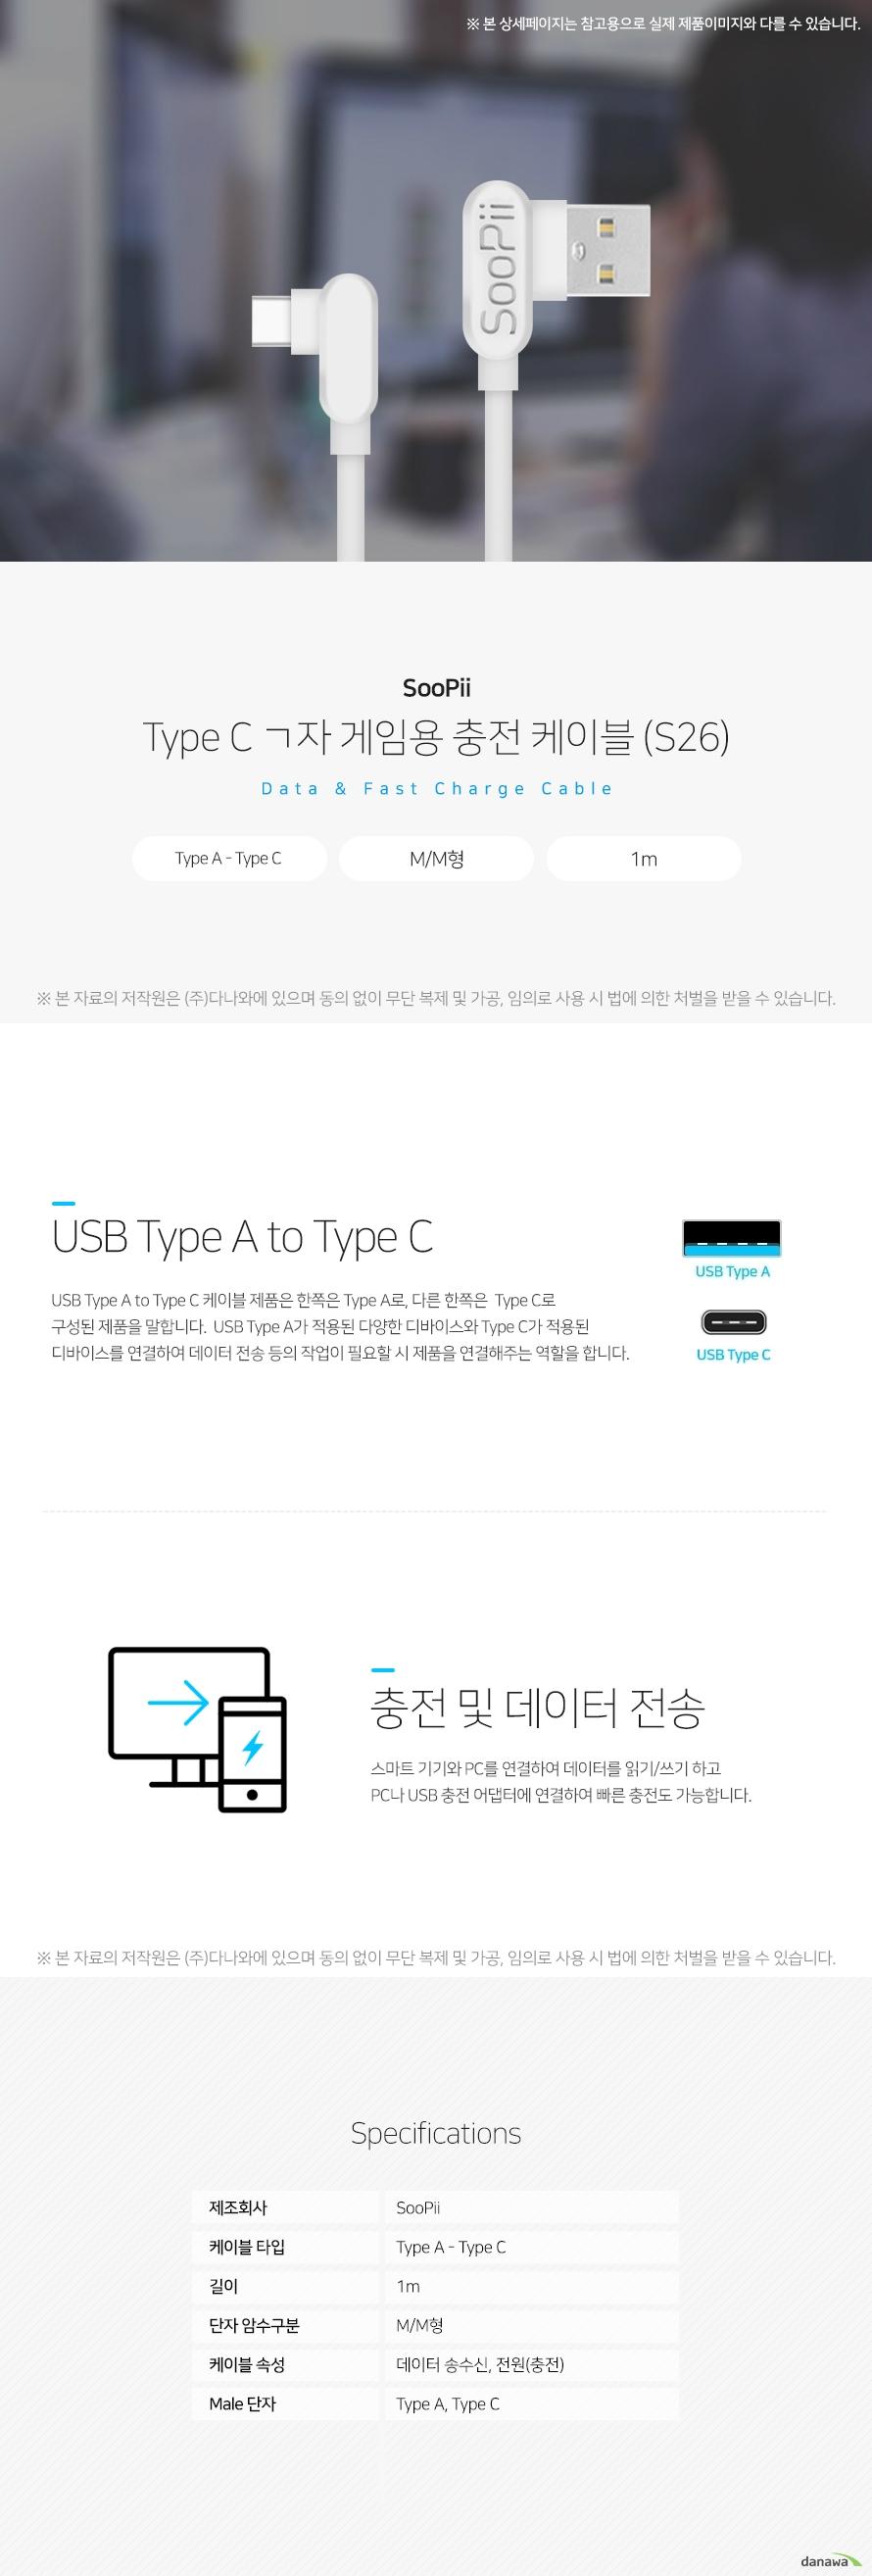 SooPii Type C ㄱ자 게임용 충전 케이블 (S26) USB Type A to Type C USB Type A to Type C 케이블 제품은 한쪽은 Type A로, 다른 한쪽은  Type C로 구성된 제품을 말합니다.  USB Type A가 적용된 다양한 디바이스와 Type C가 적용된 디바이스를 연결하여 데이터 전송 등의 작업이 필요할 시 제품을 연결해주는 역할을 합니다.   충전 및 데이터 전송 스마트 기기와 PC를 연결하여 데이터를 읽기/쓰기 하고 PC나 USB 충전 어댑터에 연결하여 빠른 충전도 가능합니다. 스펙 제조회사 SooPii 케이블 타입 Type A - Type C 길이 1m 단자 암수구분 M/M형 케이블 속성 데이터 송수신, 전원(충전) Male 단자 Type A, Type C